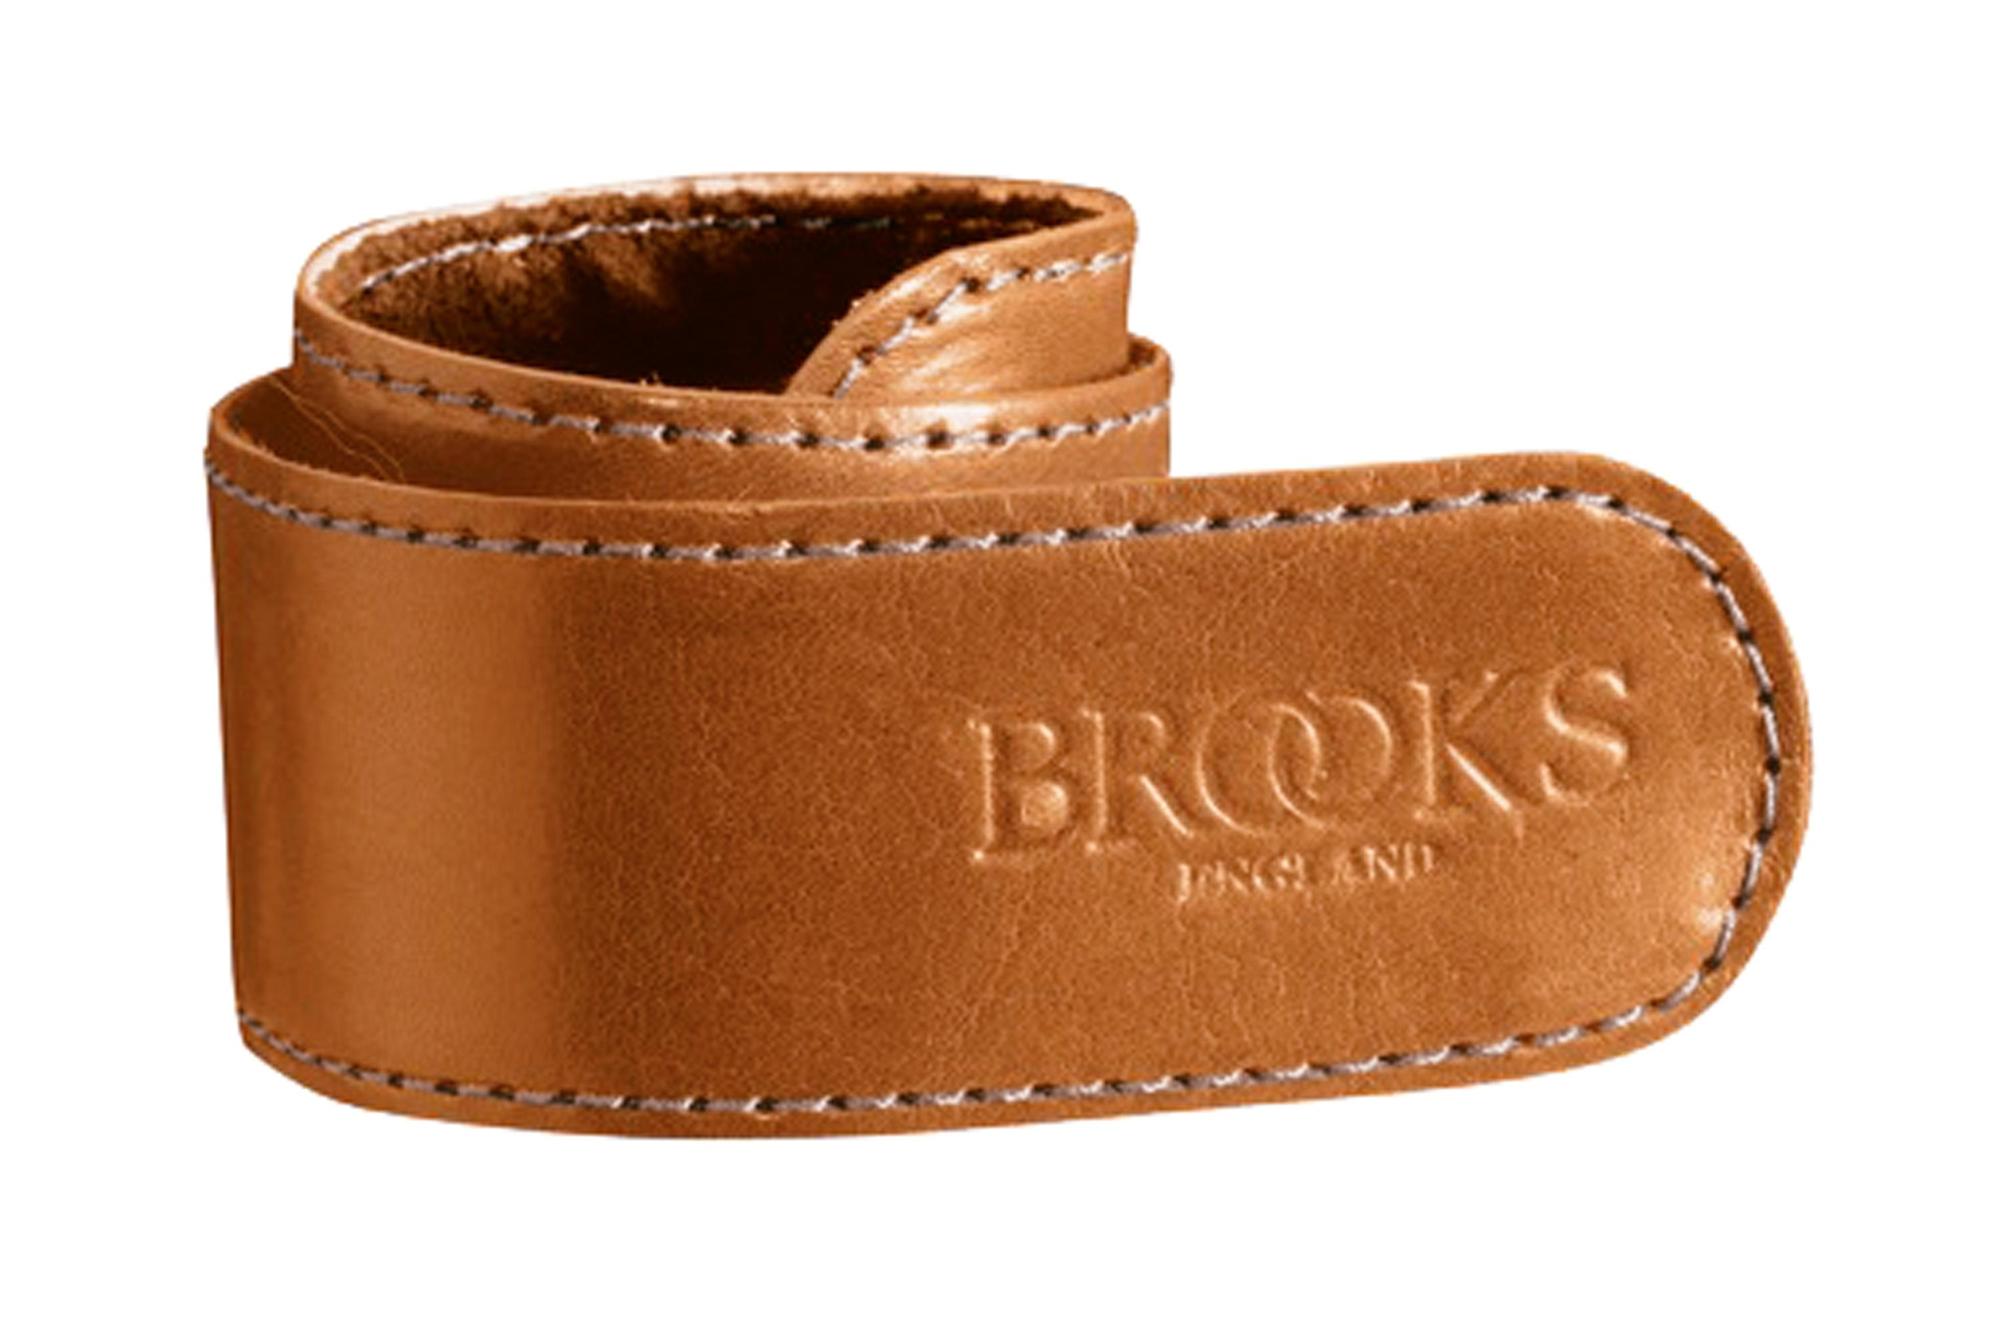 Brooks Hosenschnappband Trouser Strap